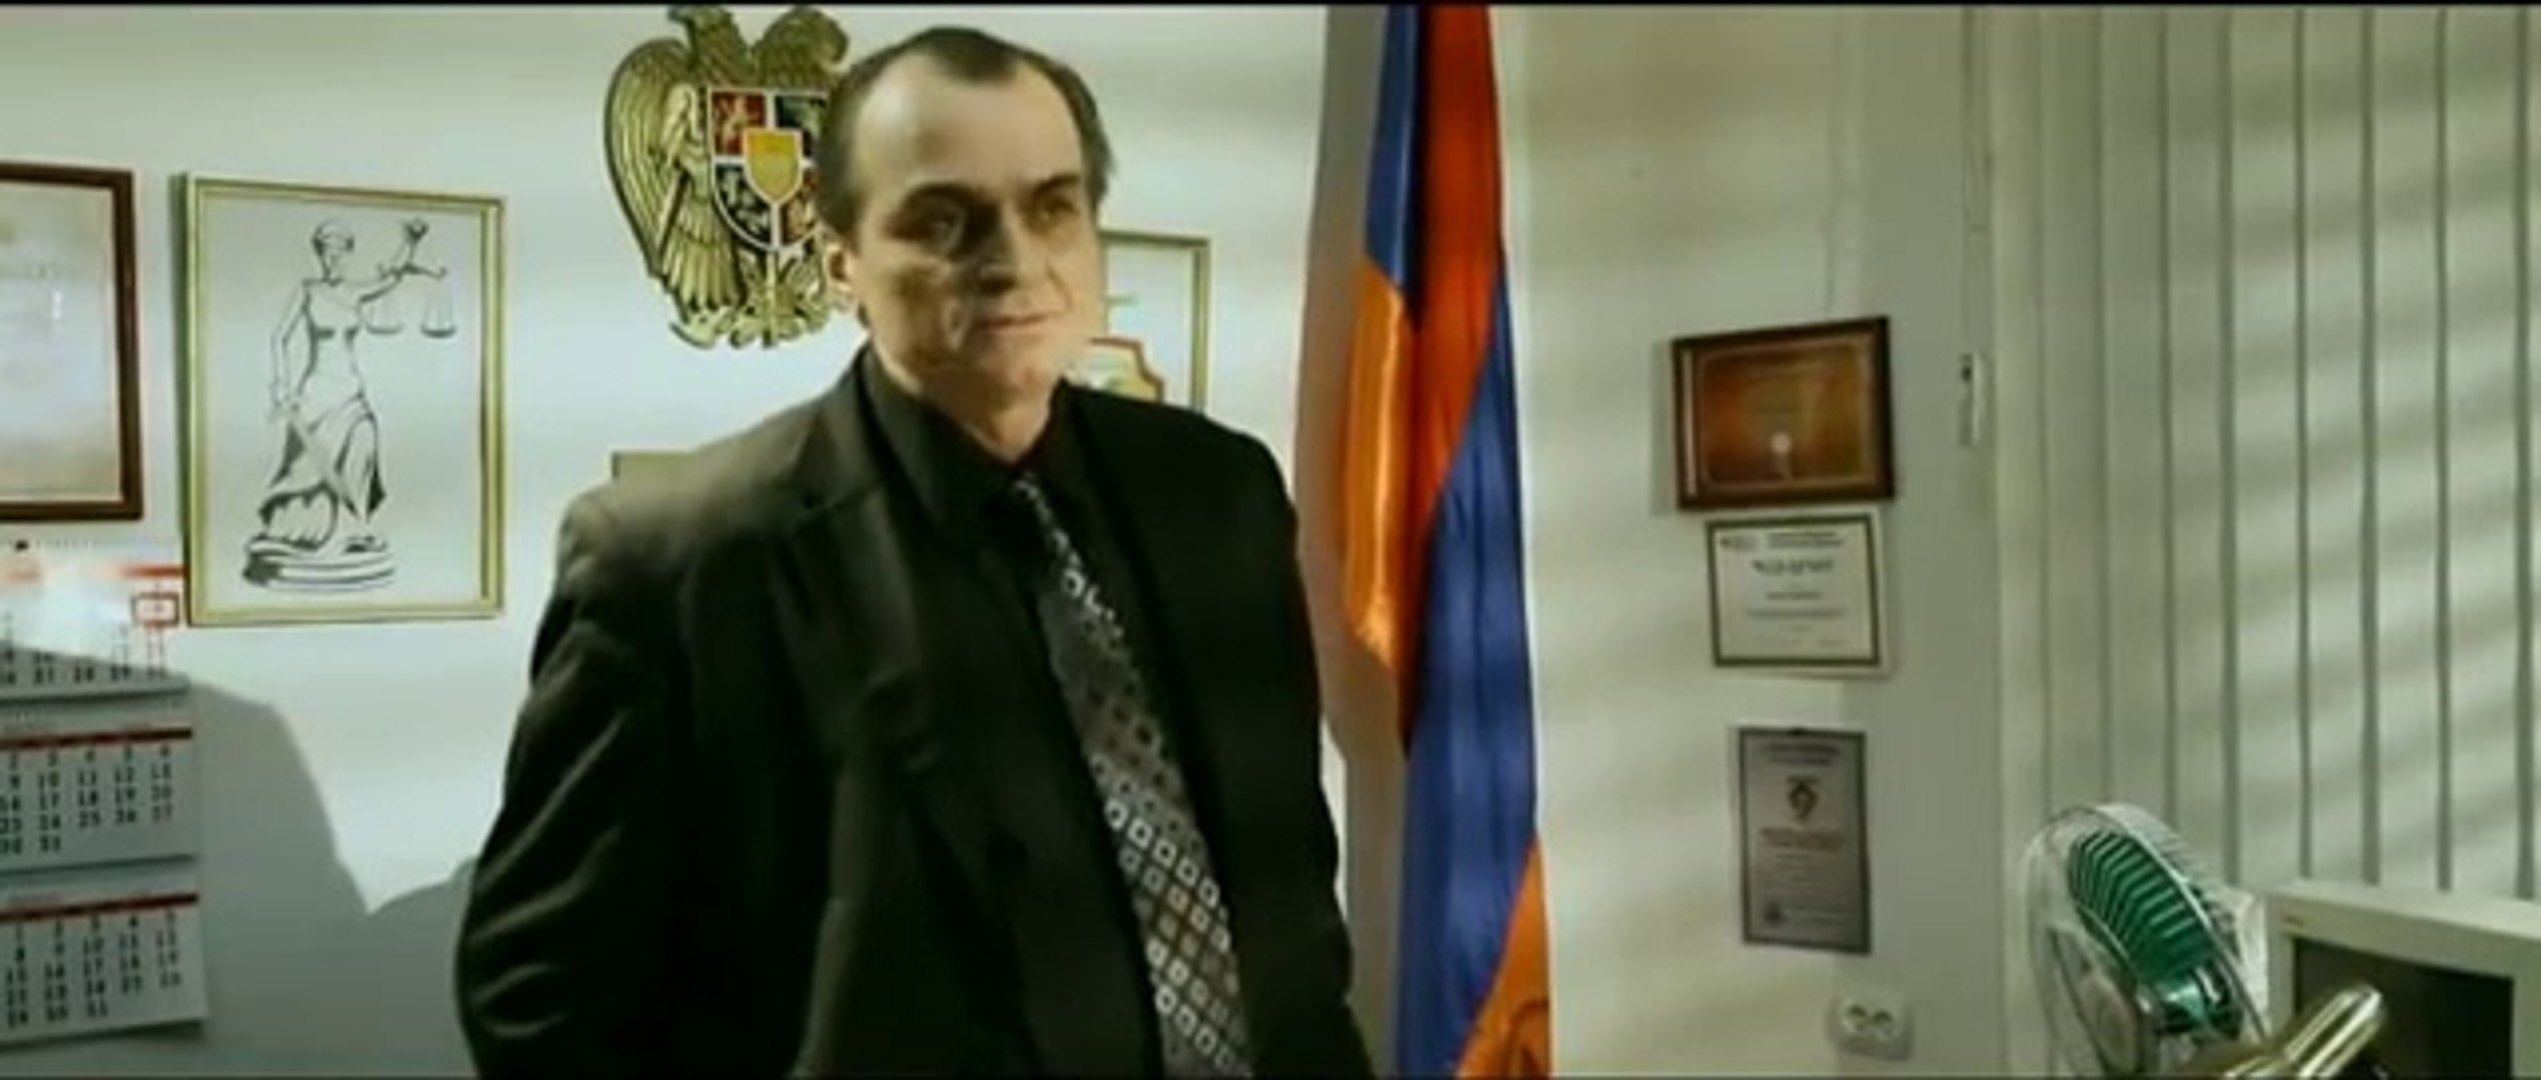 Смотреть онлайн армянский сериал Xaghic durs_21